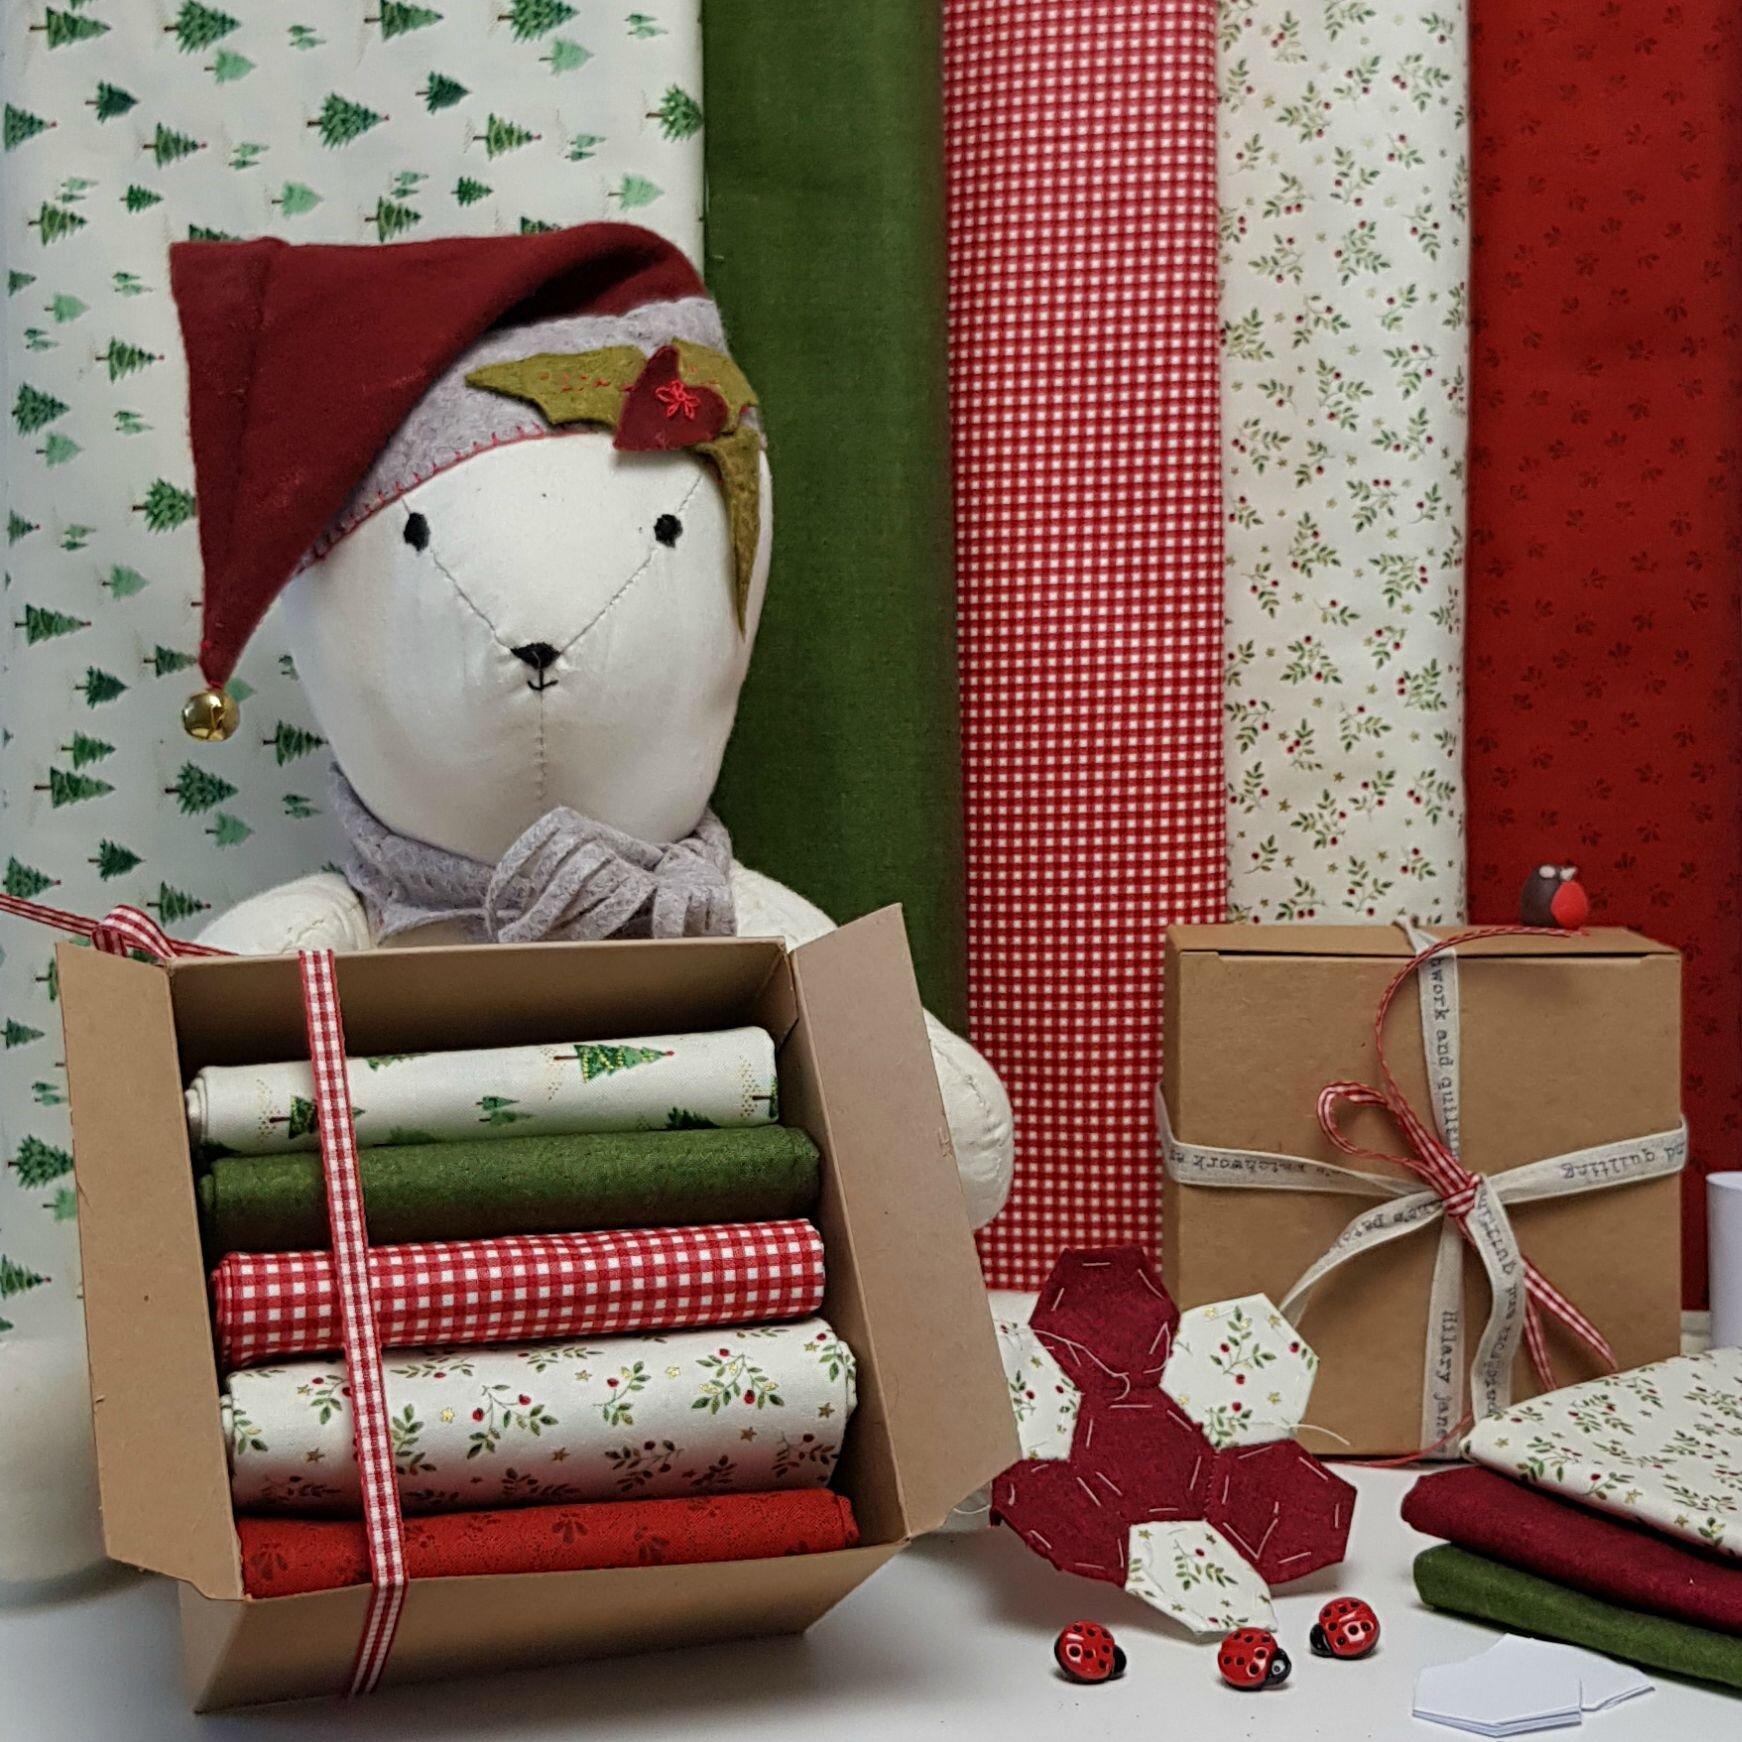 ChristmasBox1.jpg